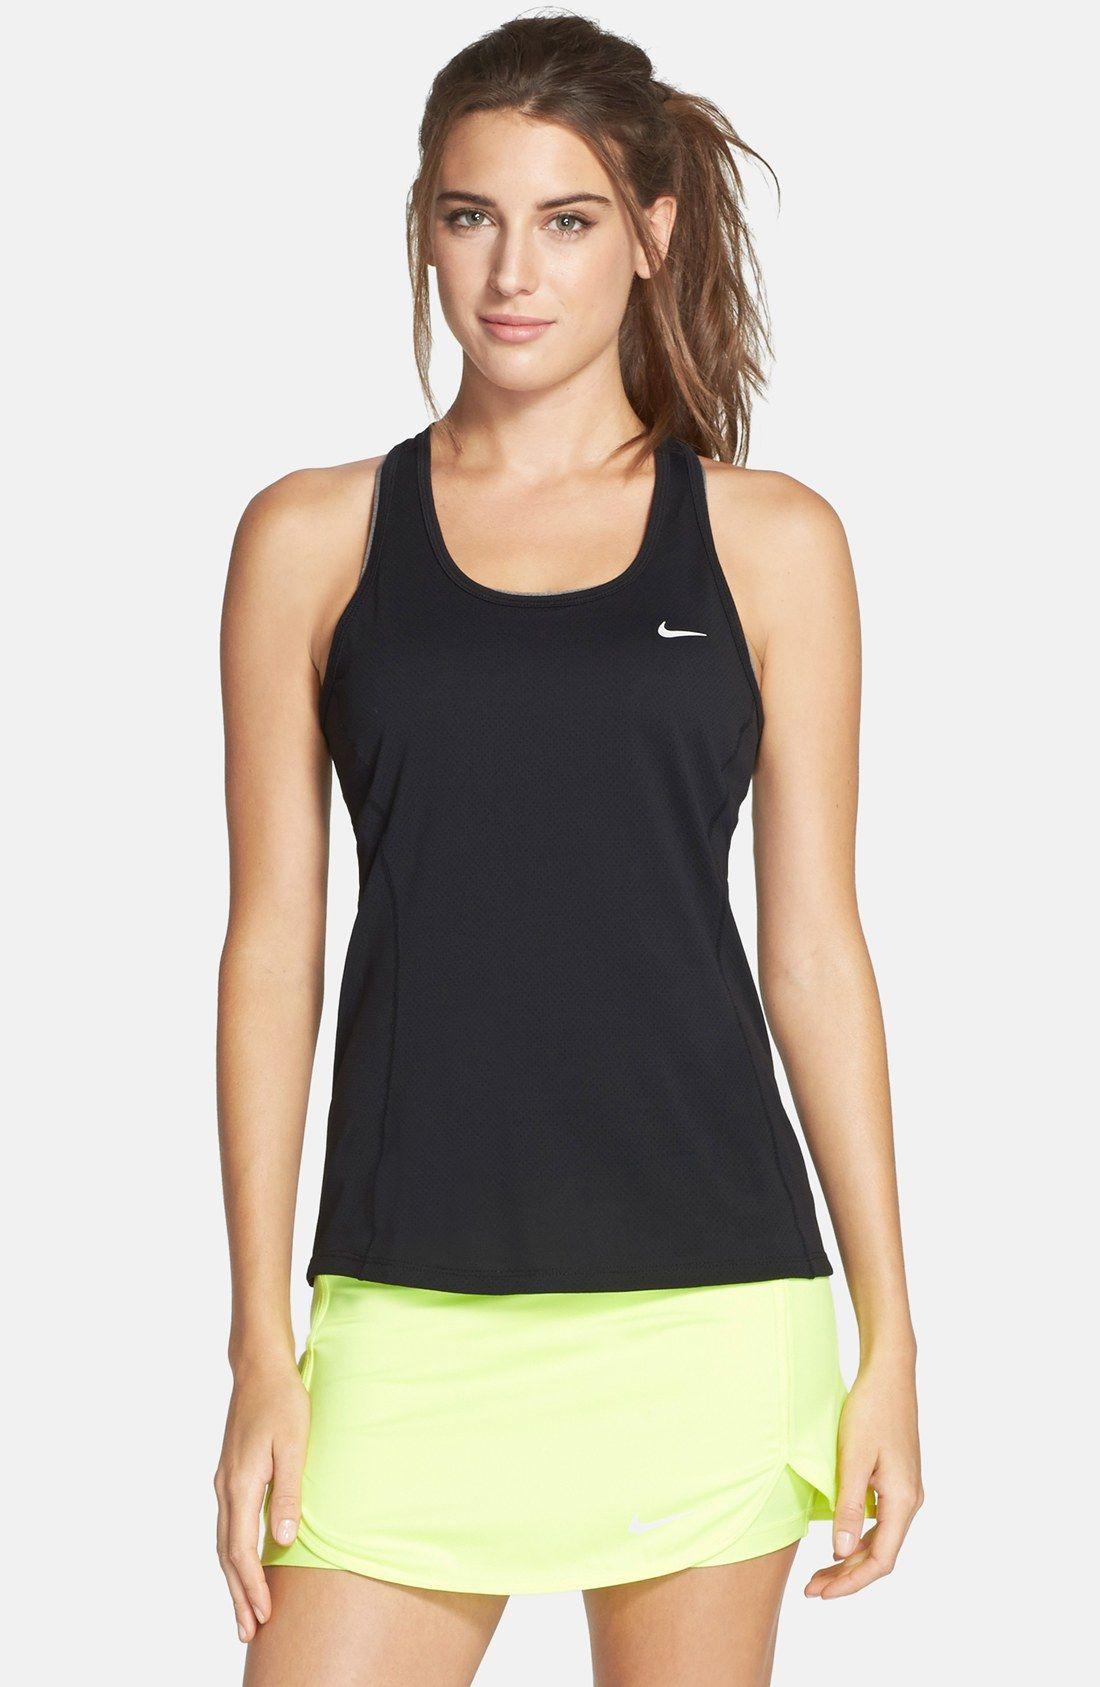 Nike contour drifit tank nordstrom running clothes